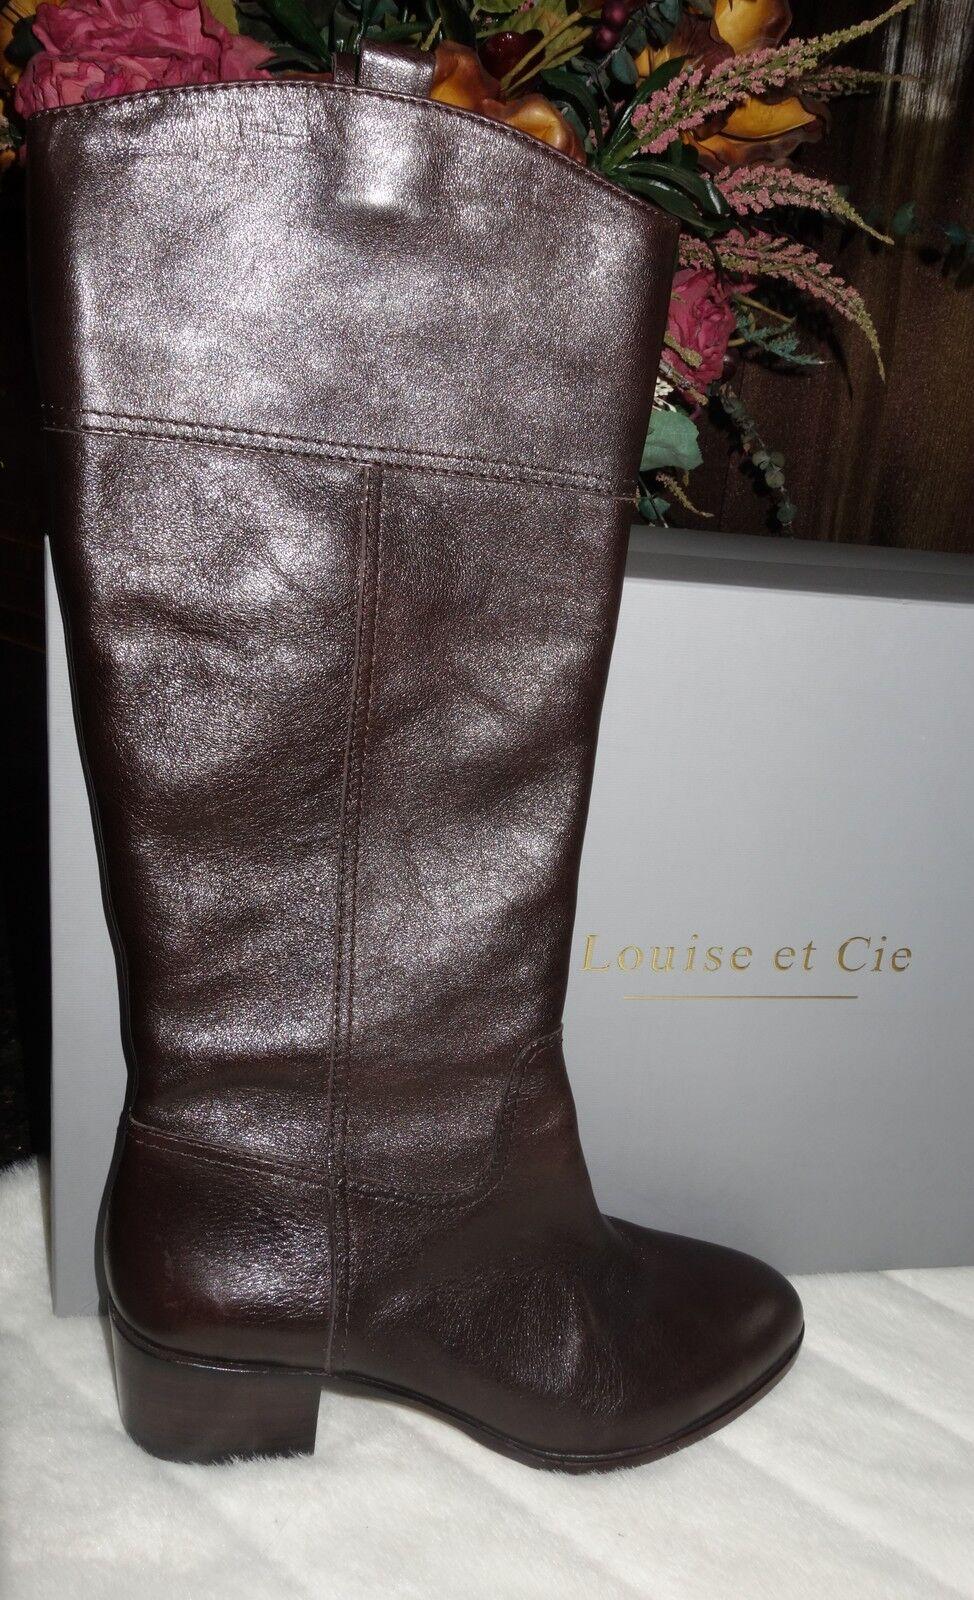 Louise Et Cie Verrah Tall Brown Leather Equestrian Boots Dark Mushroom 39 new